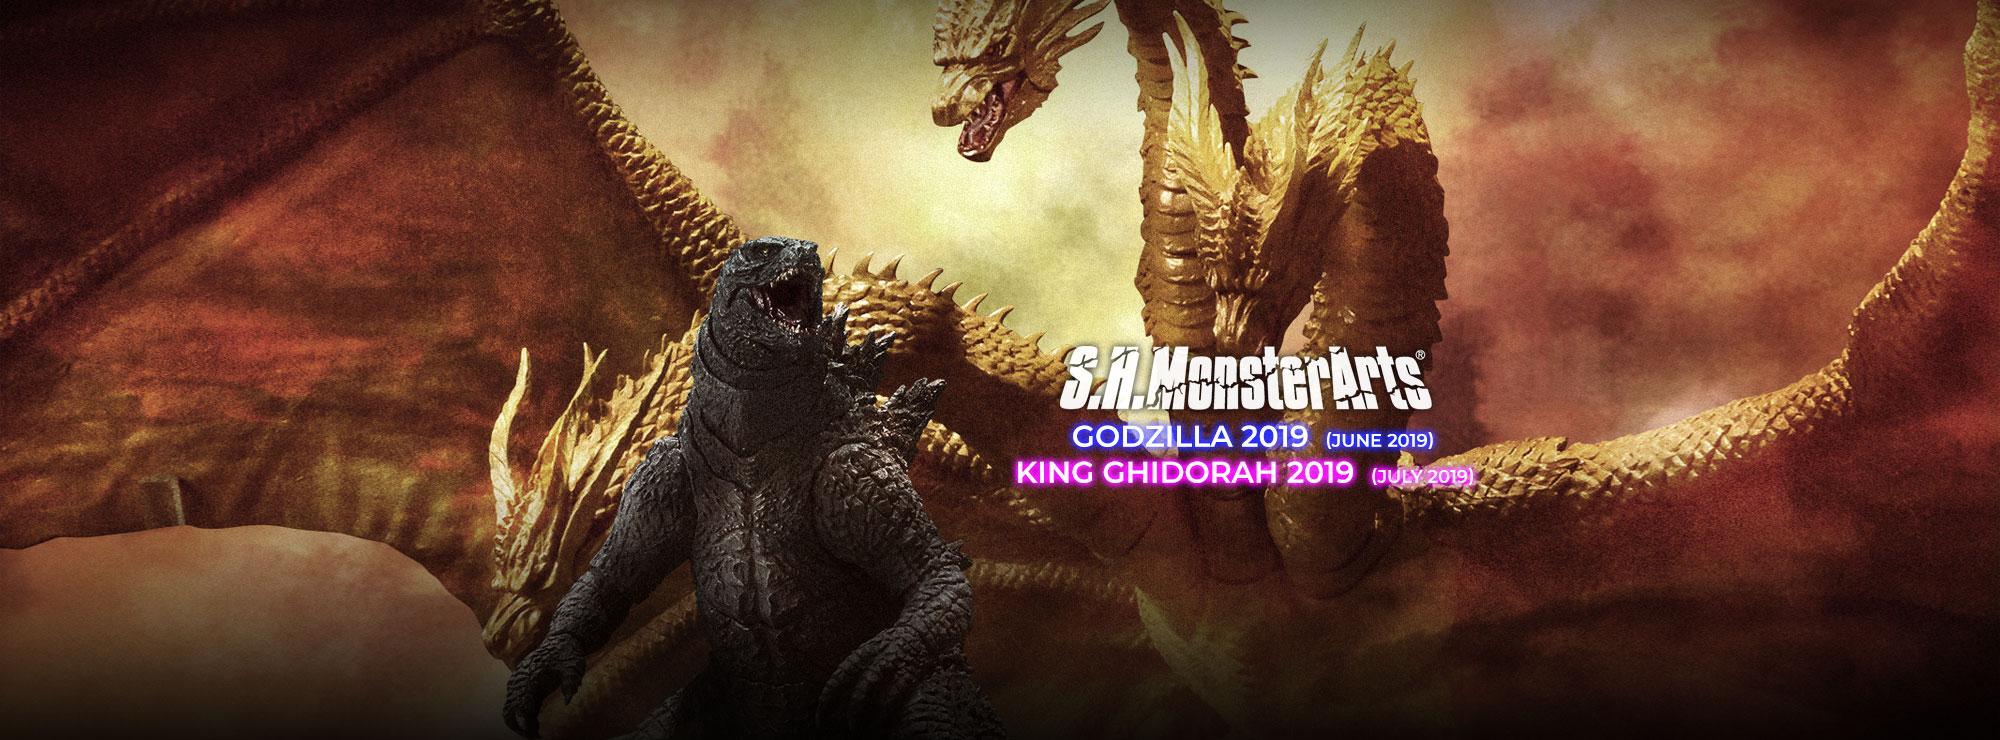 S.H.Monsterarts Godzilla 2019